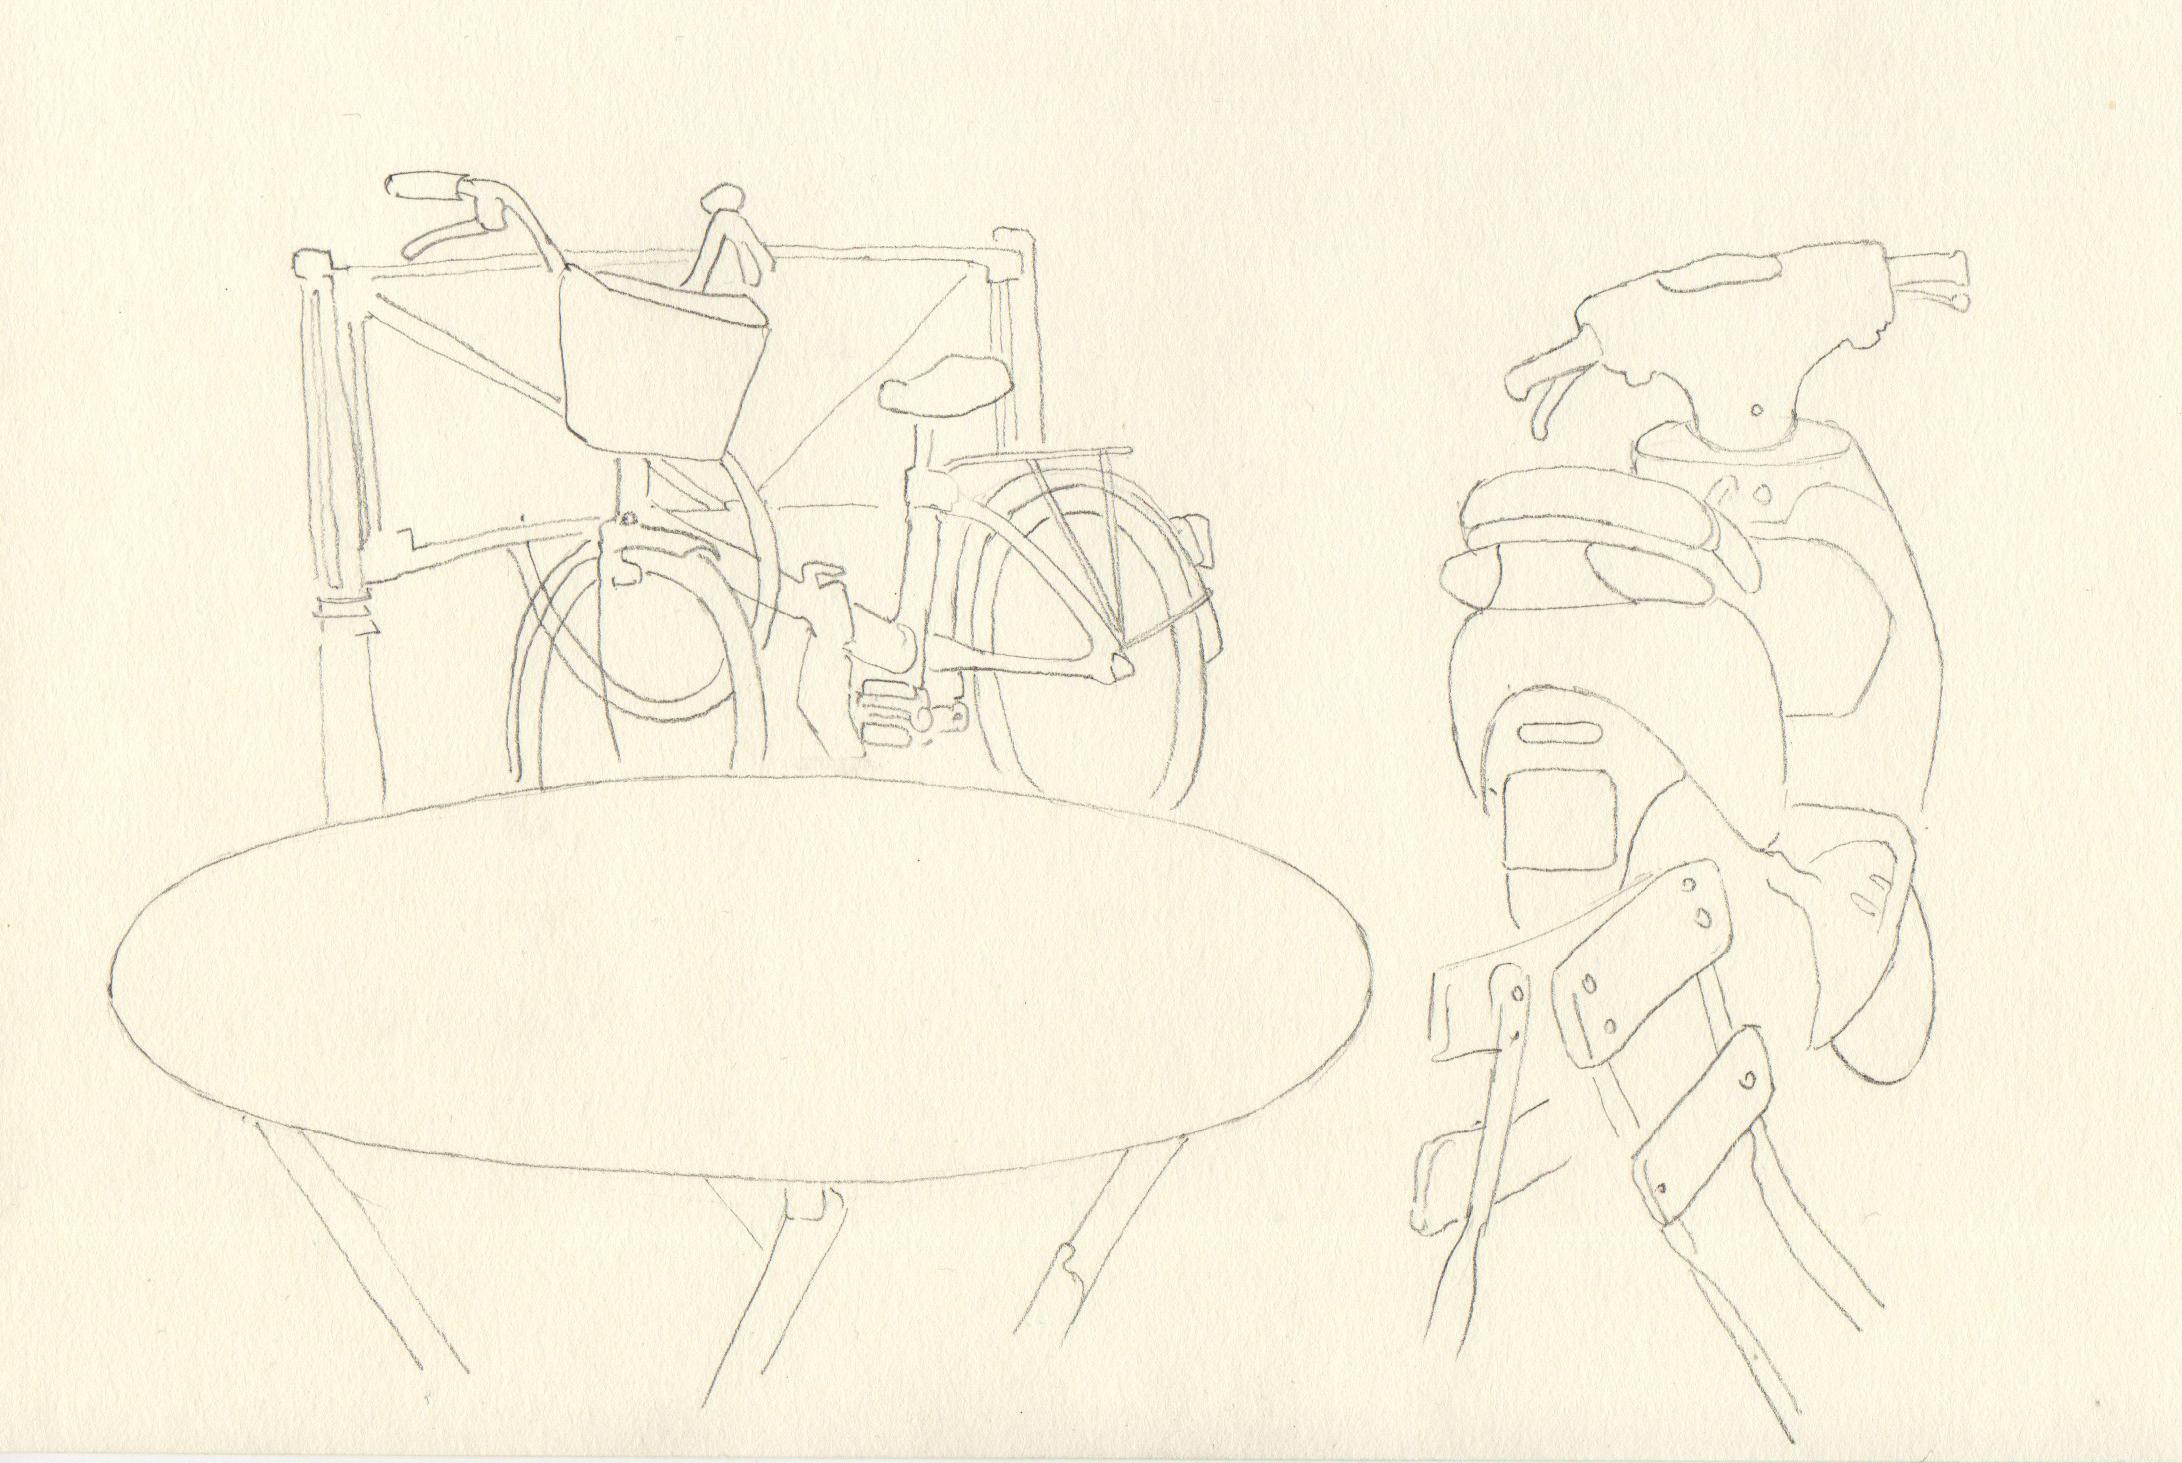 2015_Sketch_F-Beudin_008